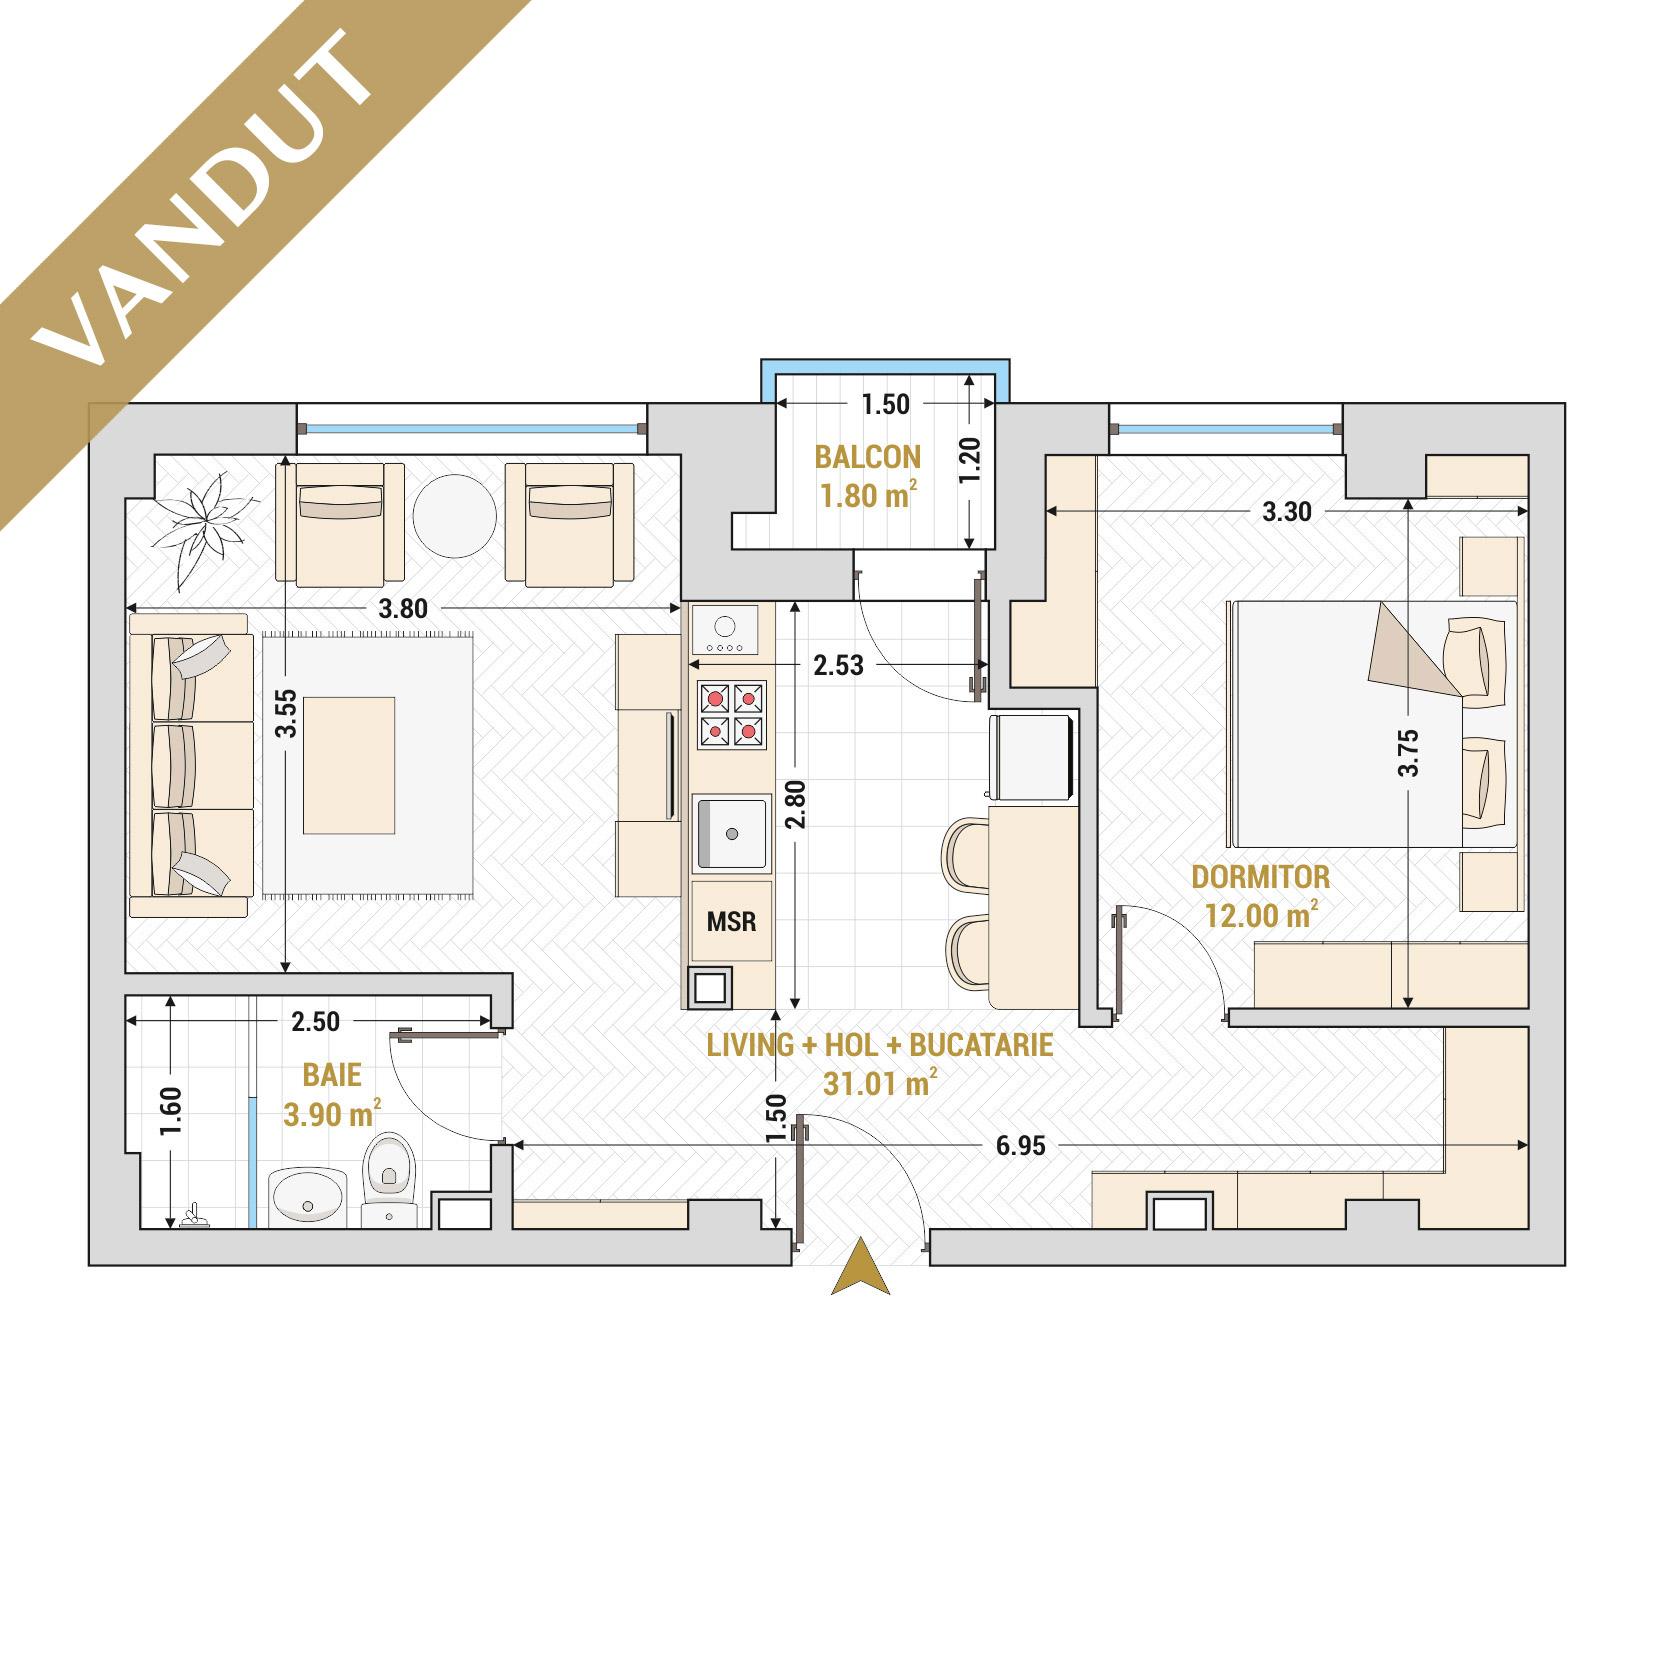 Apartamente cu 2 camere de vanzare Bucuresti - Catedral Residence - Marriott, Piata Unirii, 13 Septembrie, Izvor - Tip 2 - T1A - VANDUT